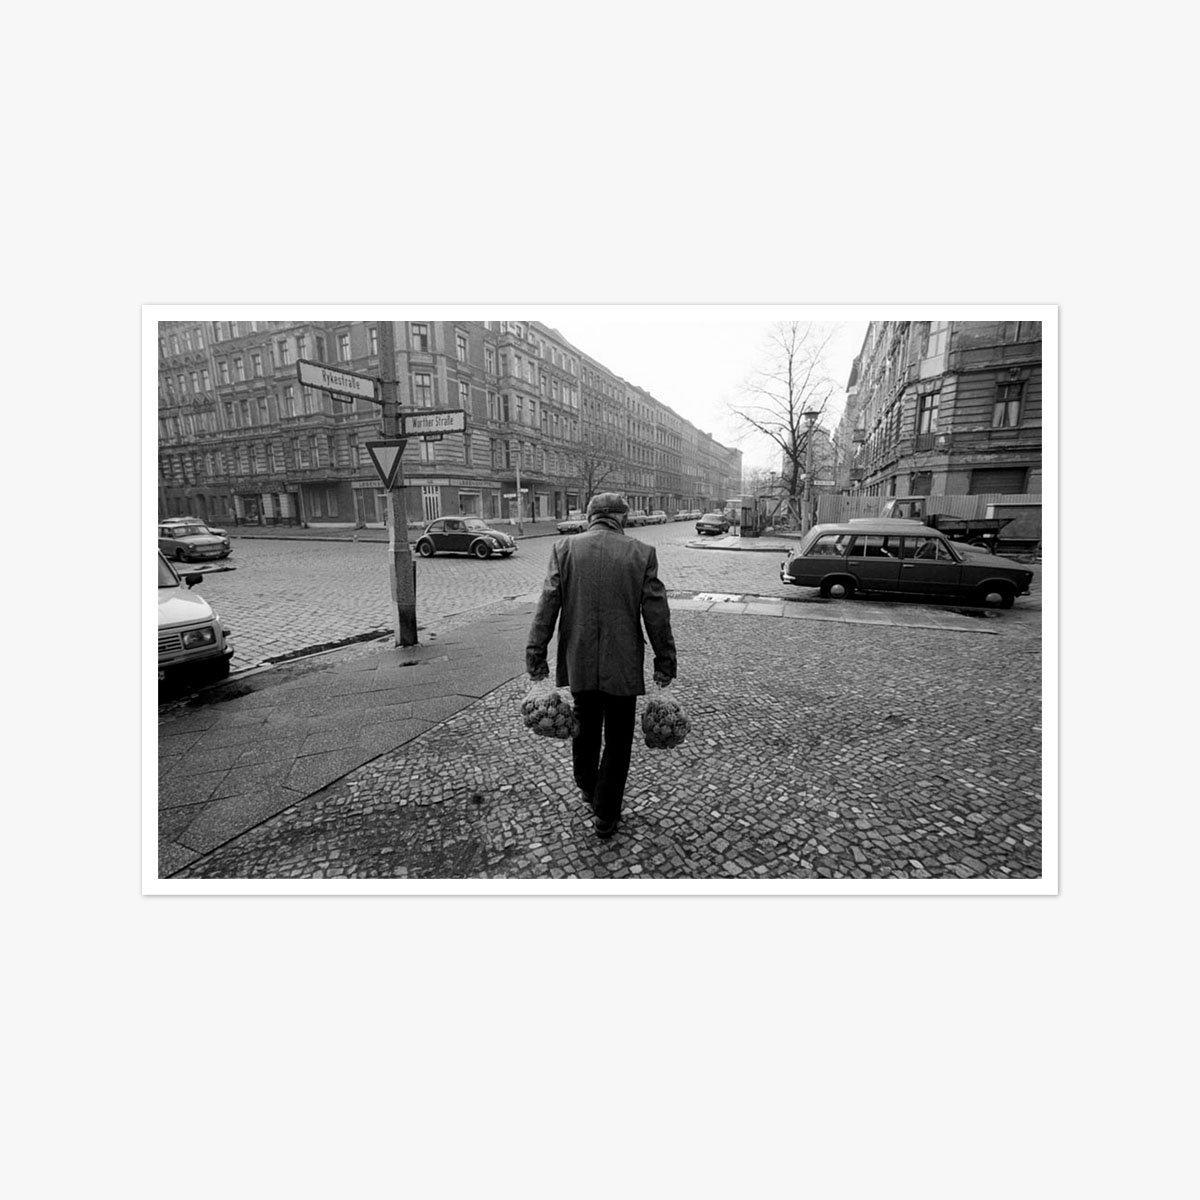 East Berlin, Shopping by Brian Harris